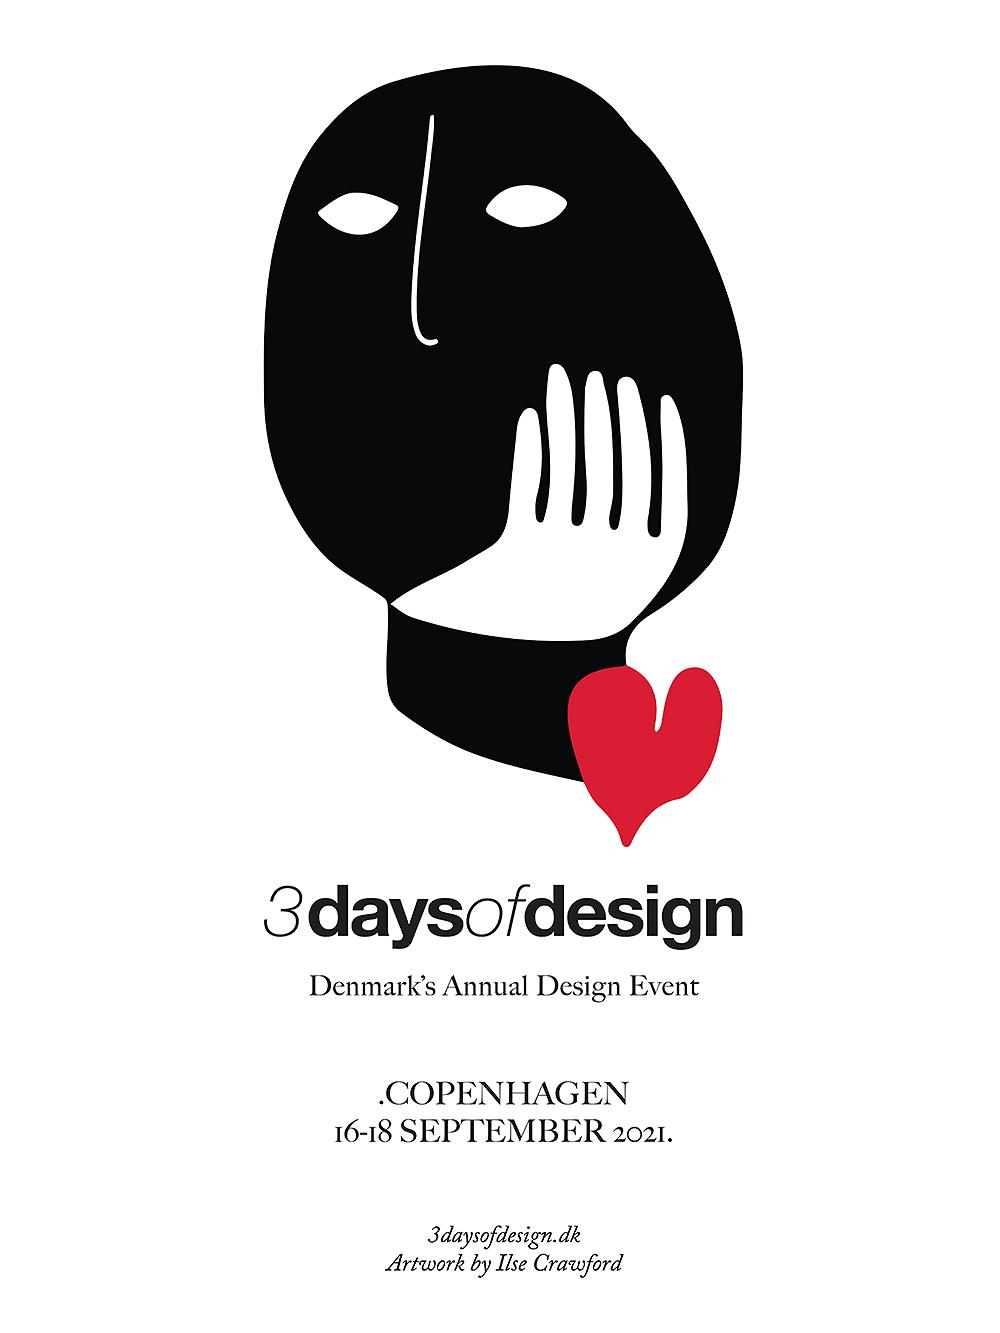 3 Days of Design 2021 in Copenhagen